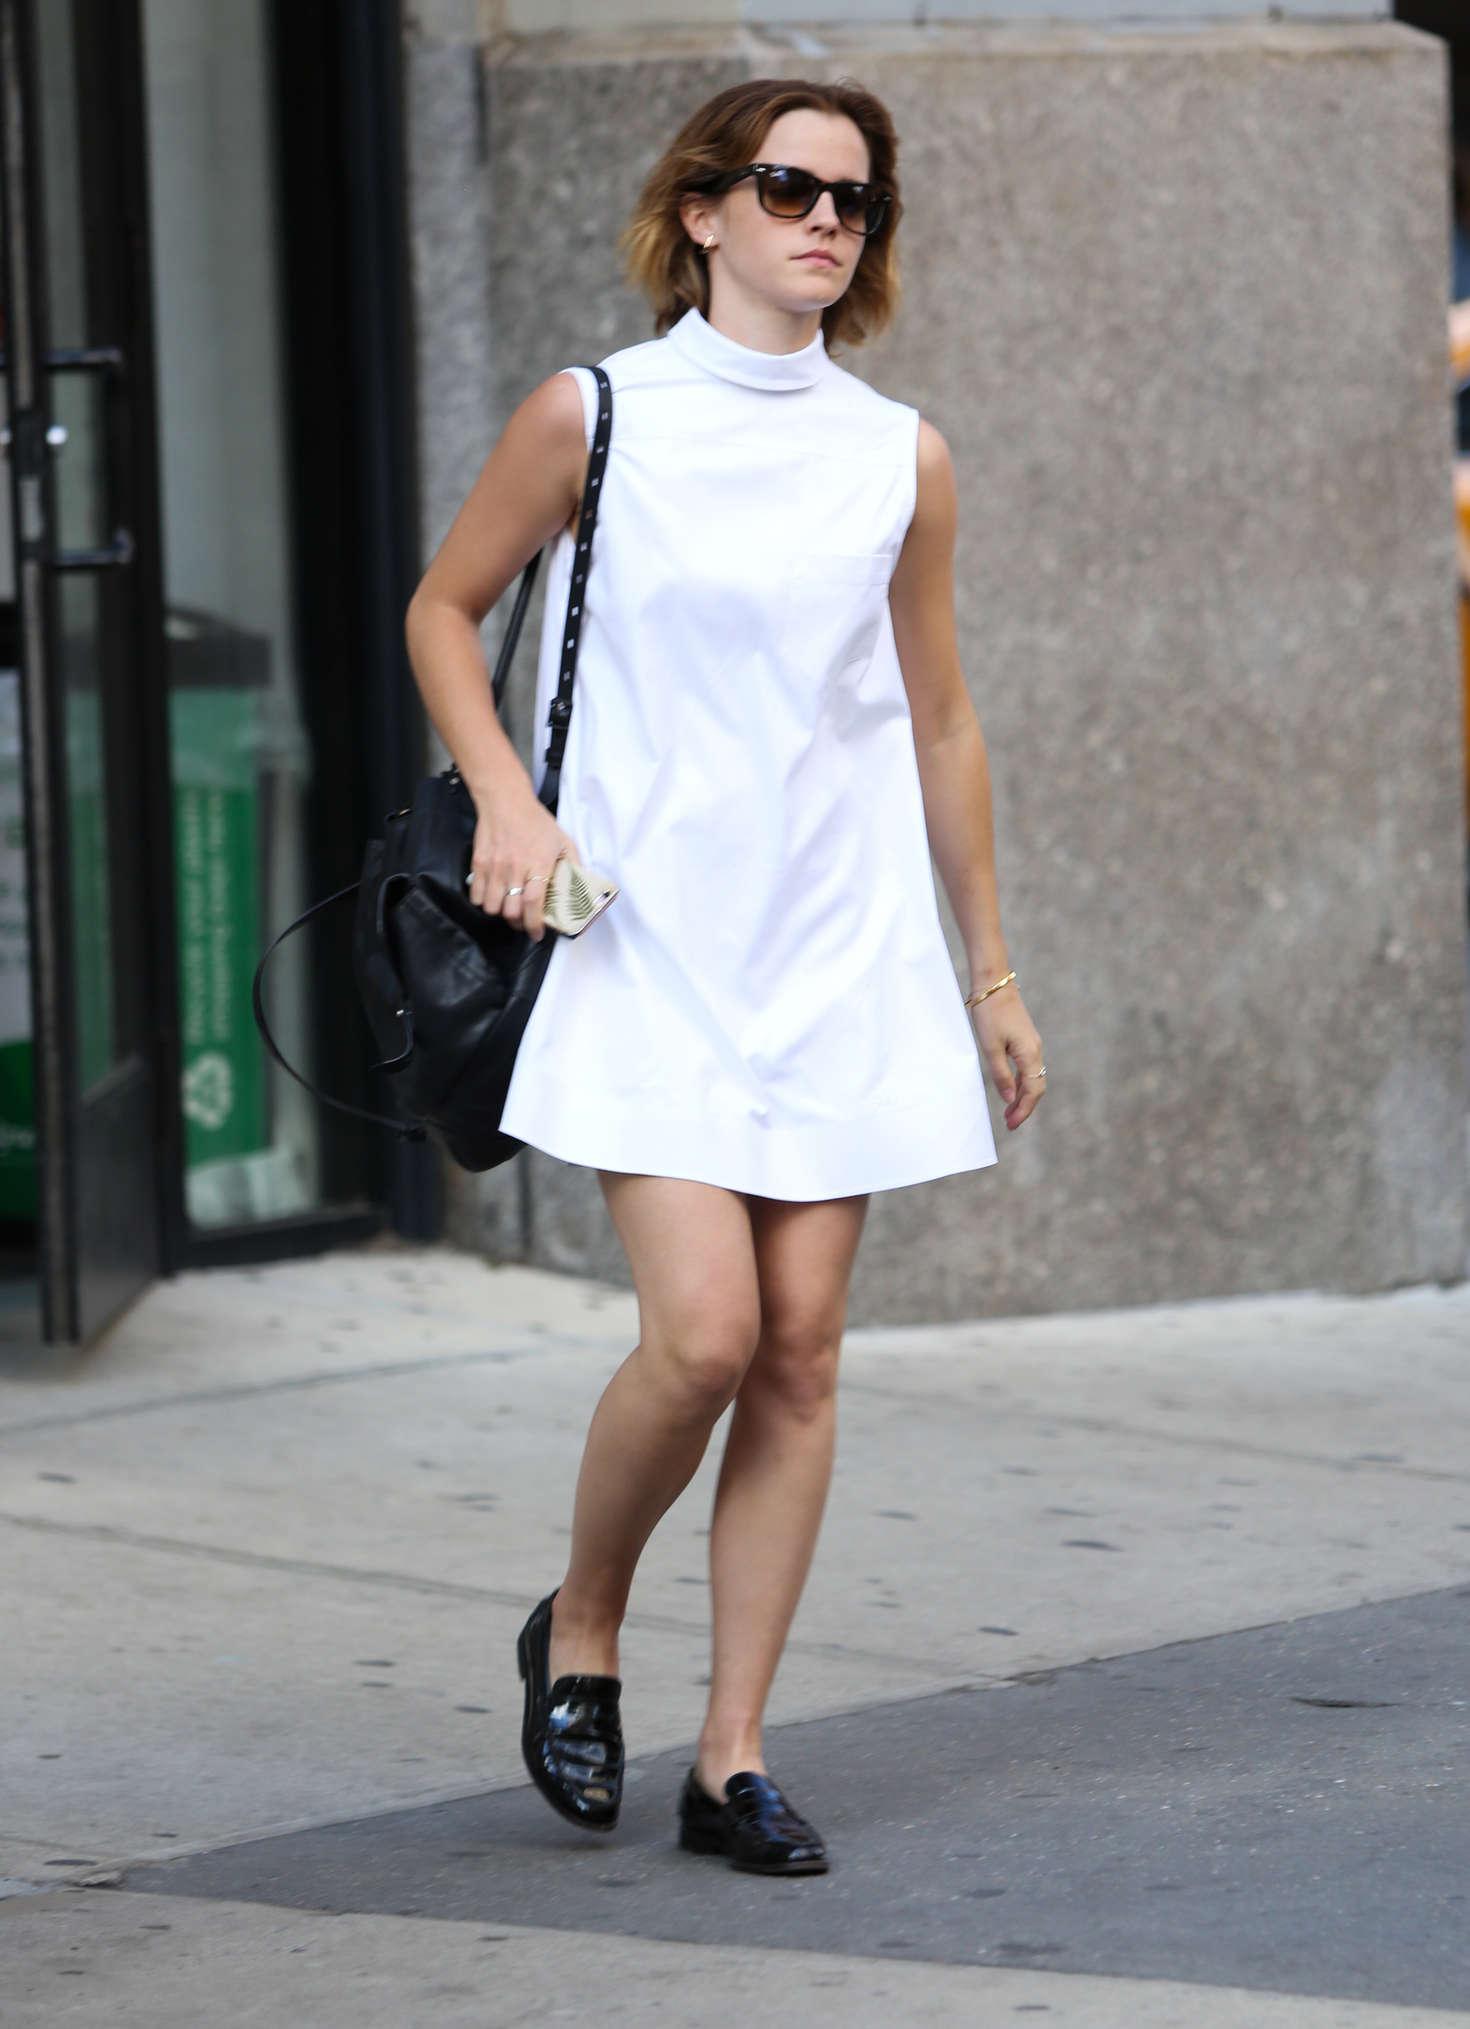 White dress emma watson - Emma Watson In White Mini Dress Out In New York